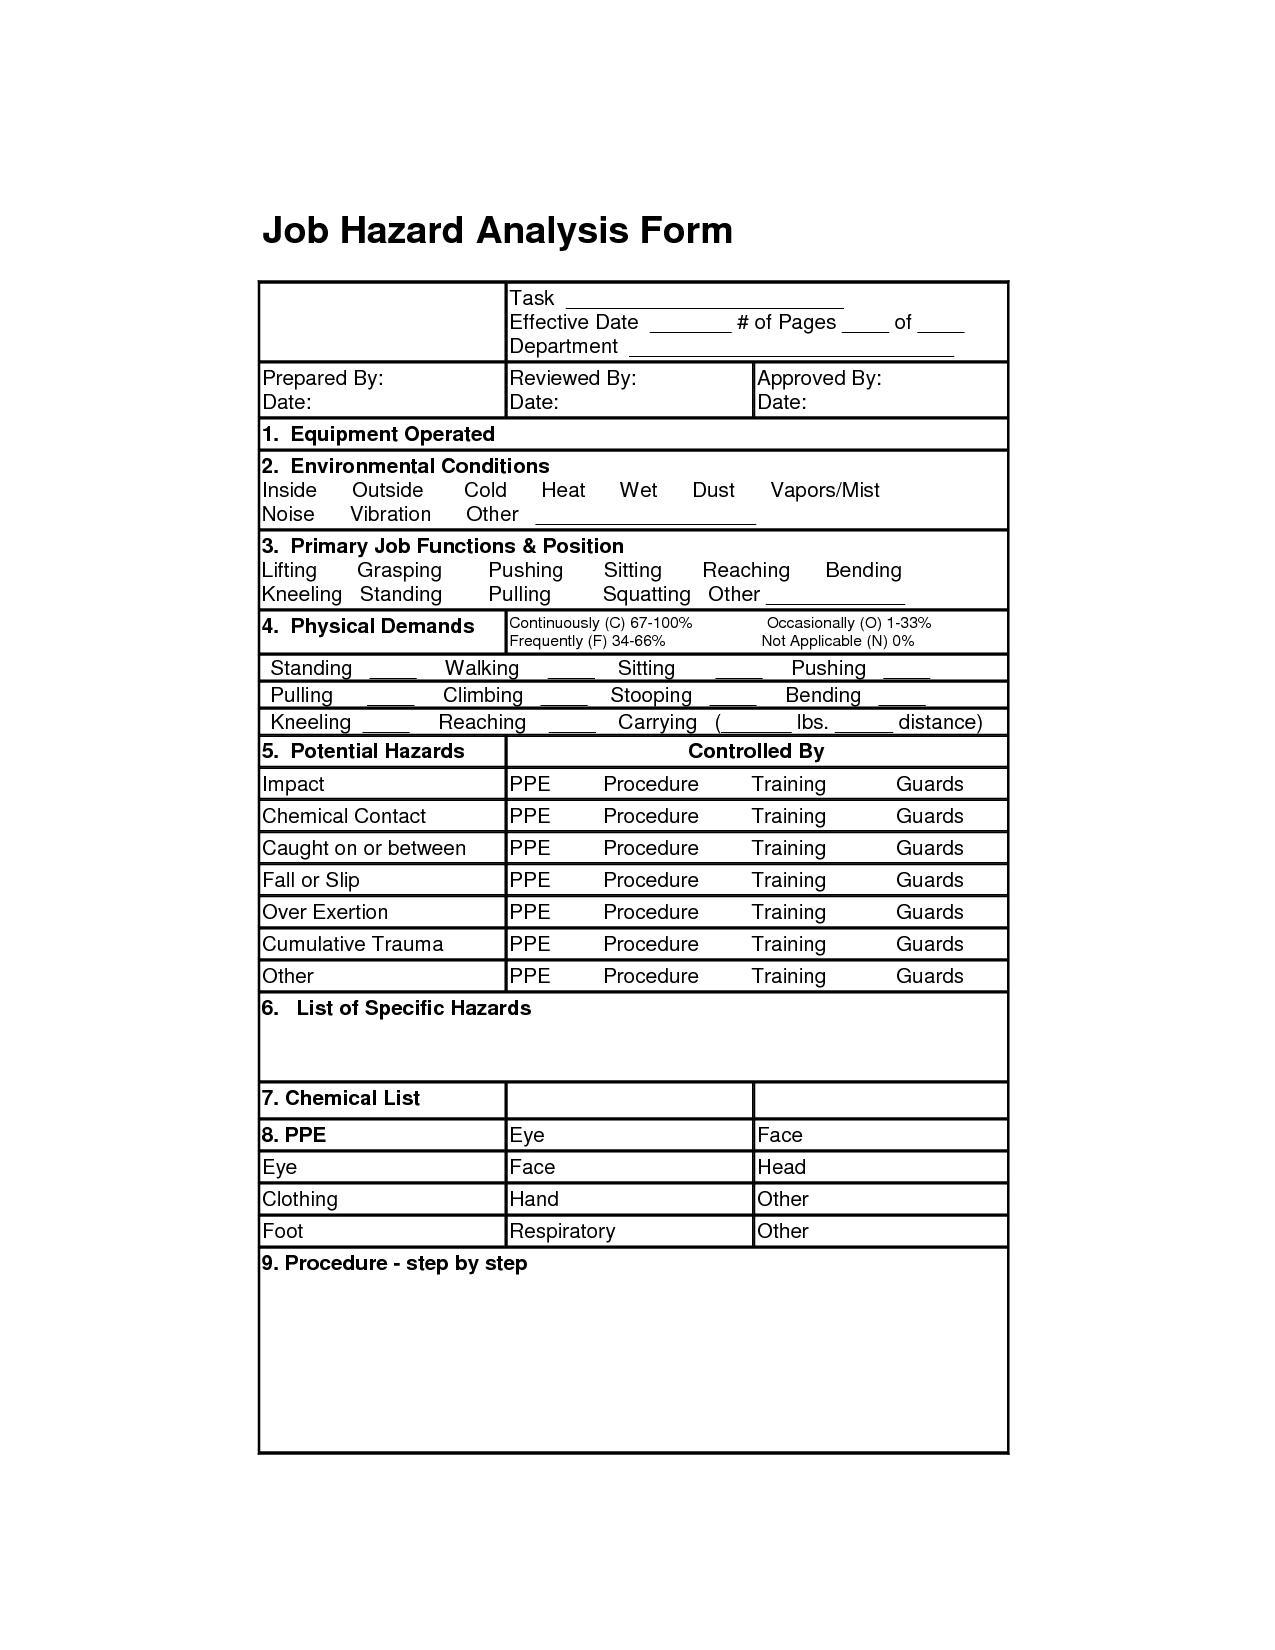 Job Hazard Analysis Form   Job Analysis Forms   Job Analysis With Safety Analysis Report Template